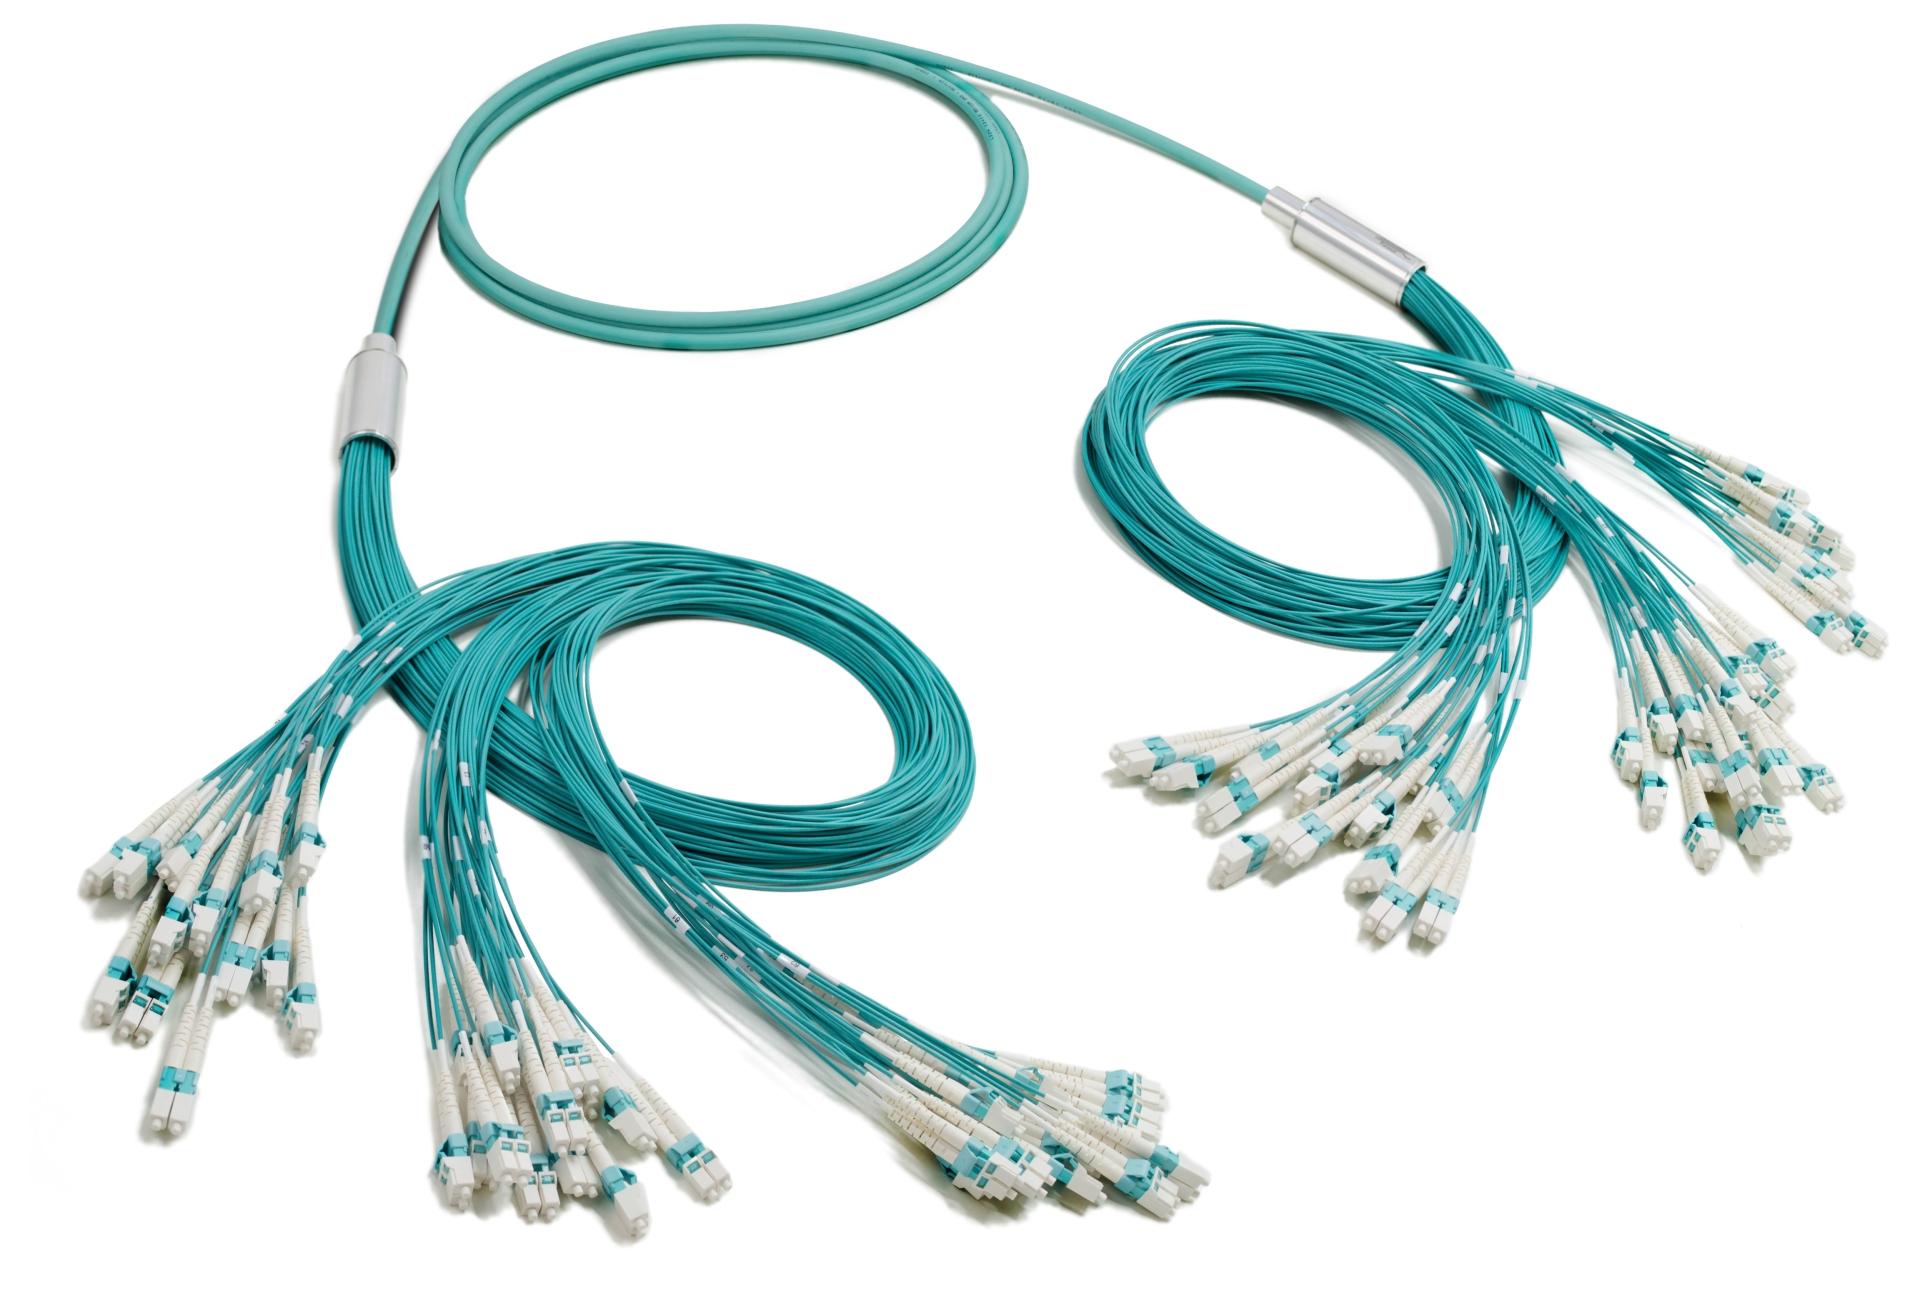 LC-LC 96-fiber Duralino trunk, free tails simplex tubing